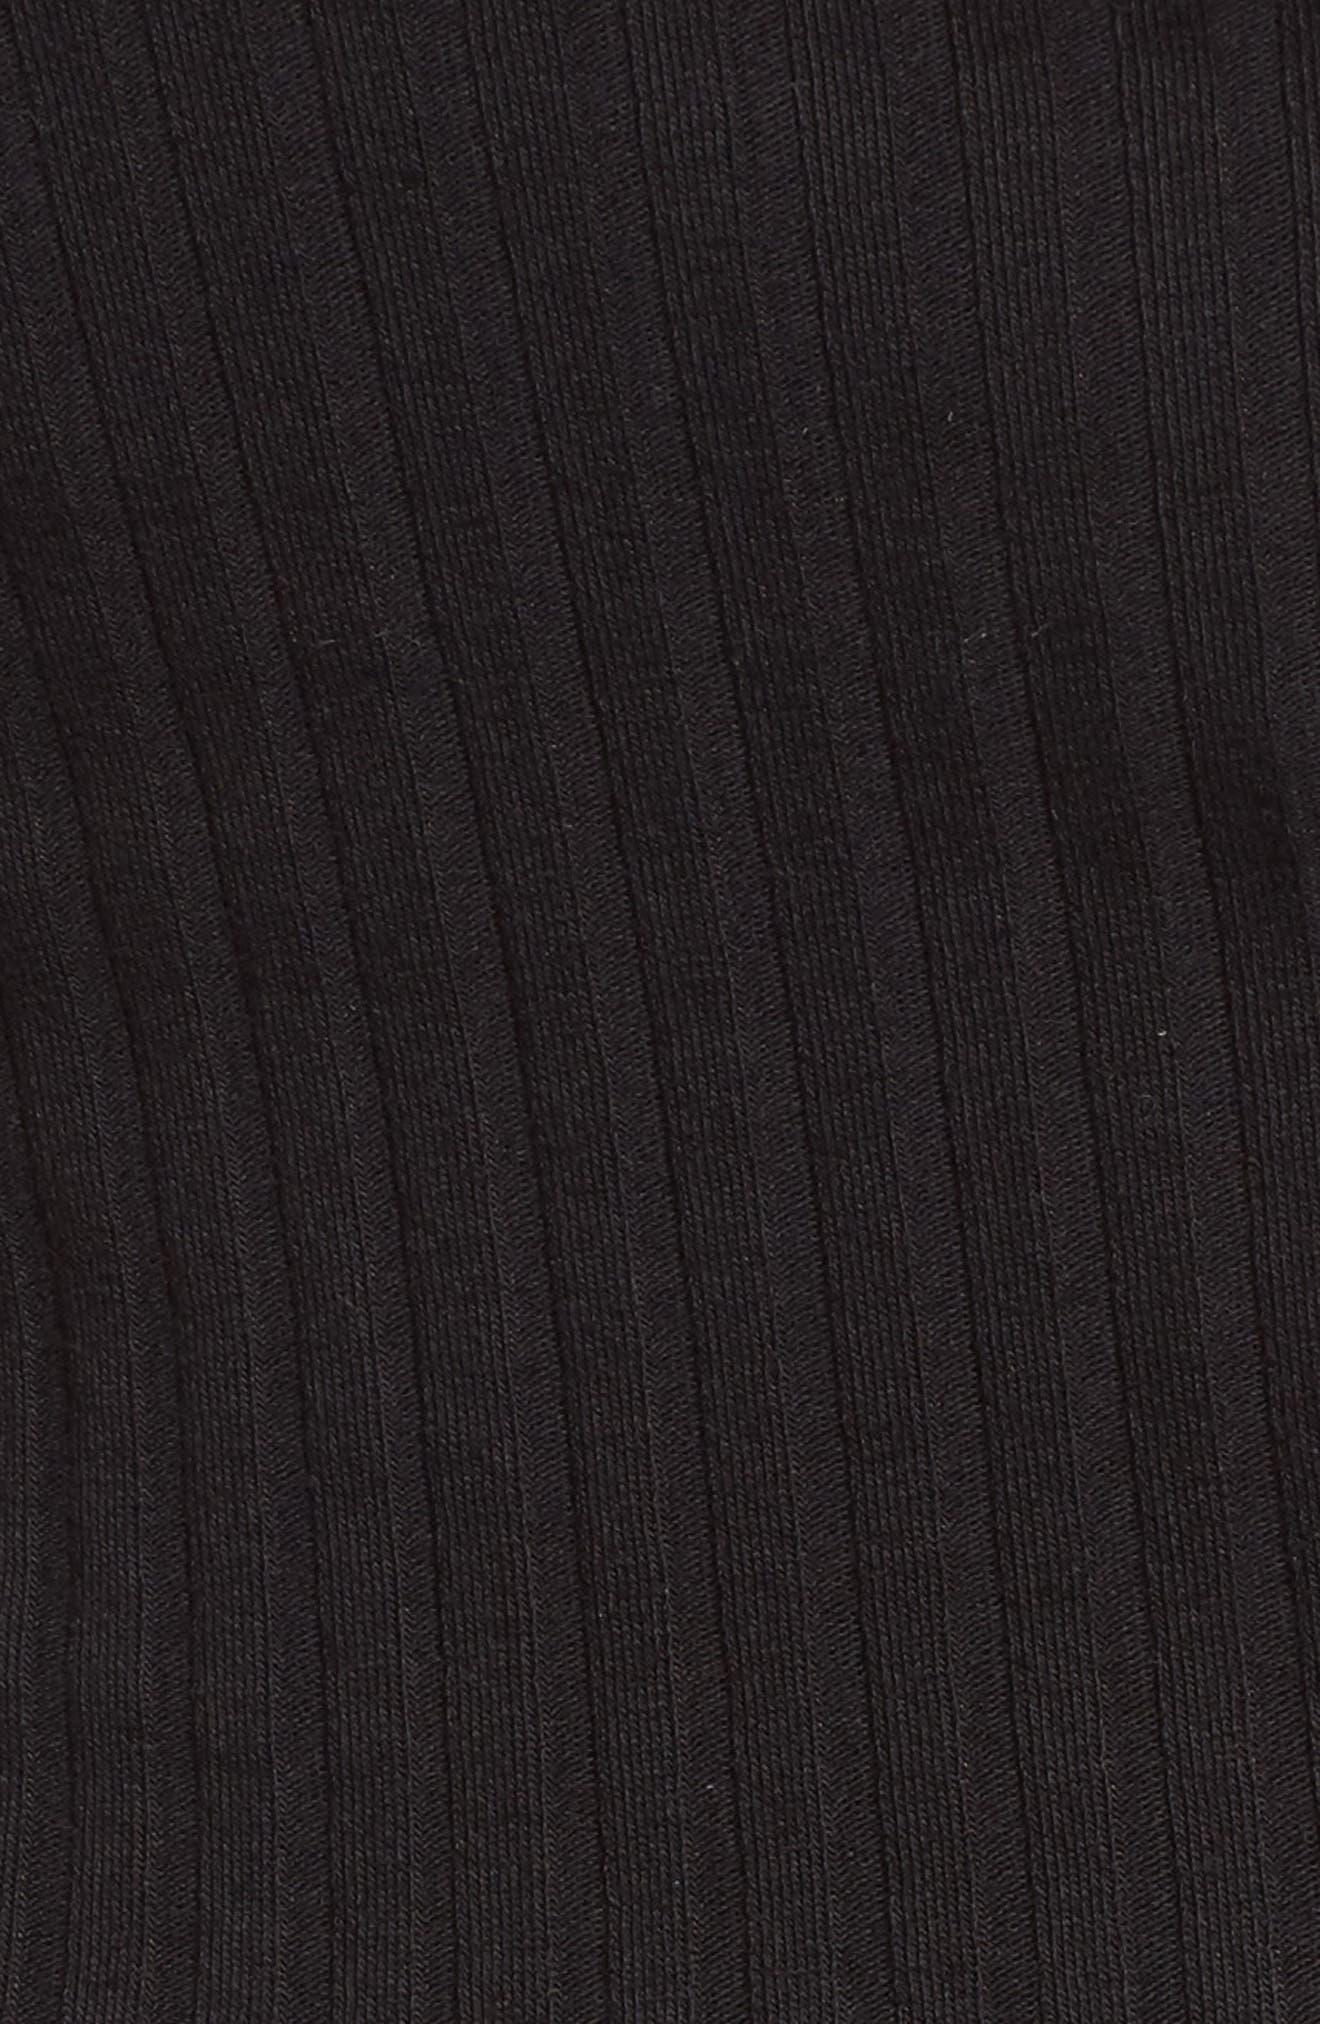 Square Neck Ribbed Crop Tank Top,                             Alternate thumbnail 5, color,                             Black